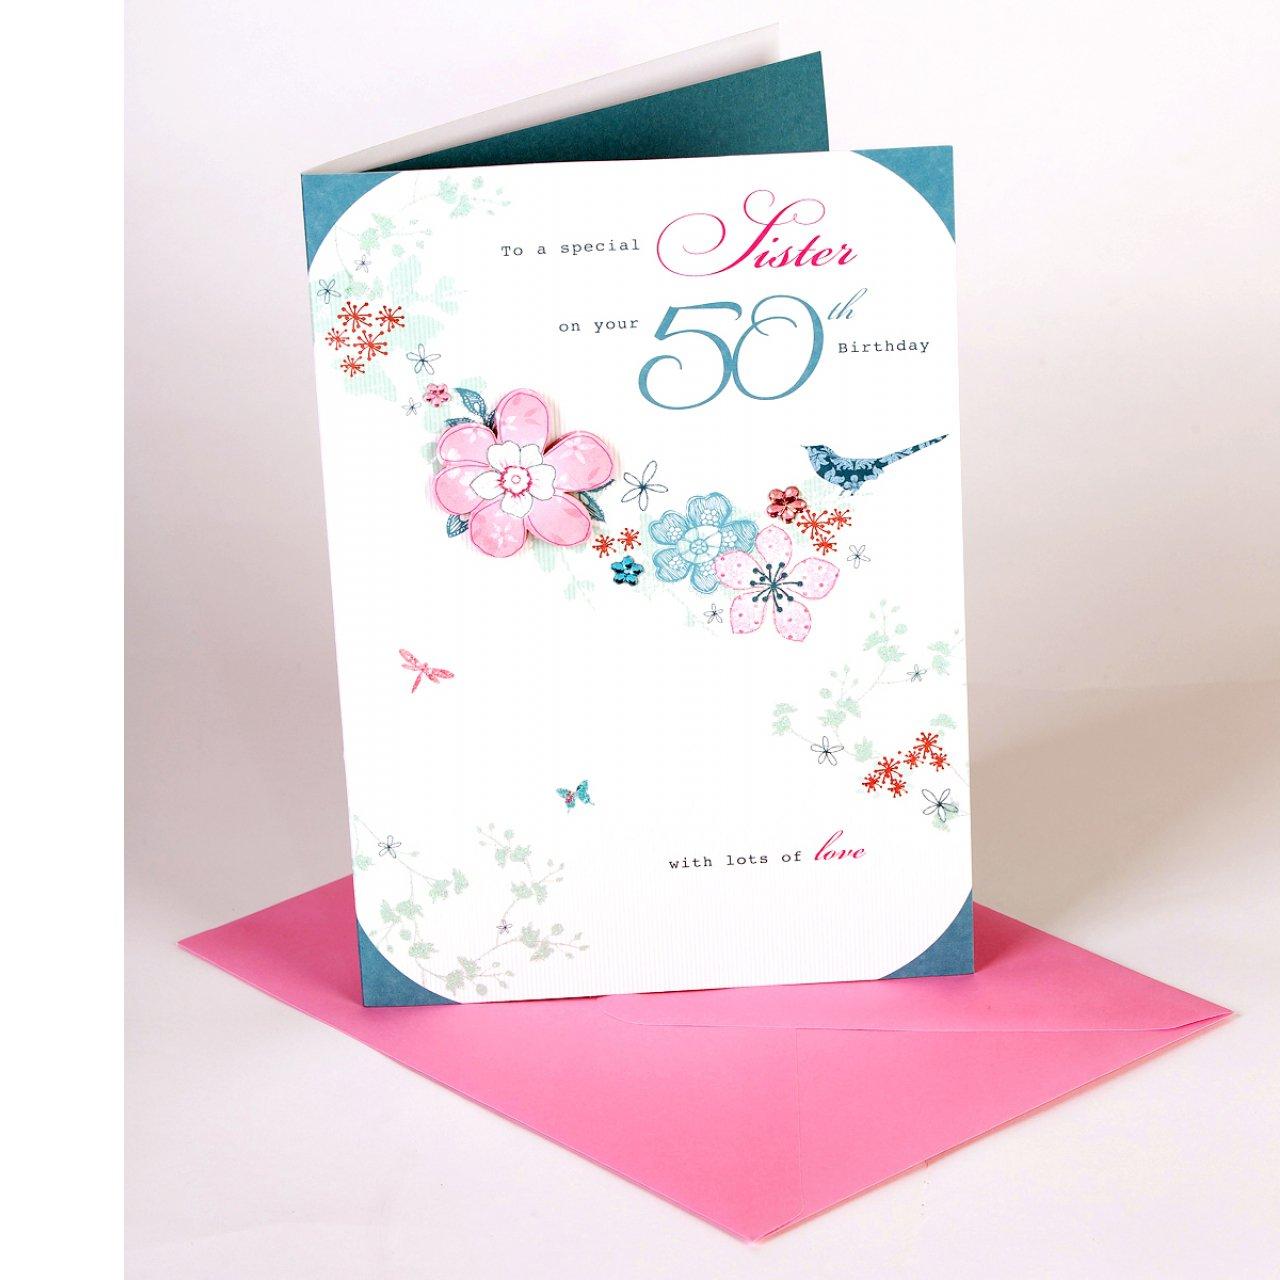 39;s Birthday Invitation Cards